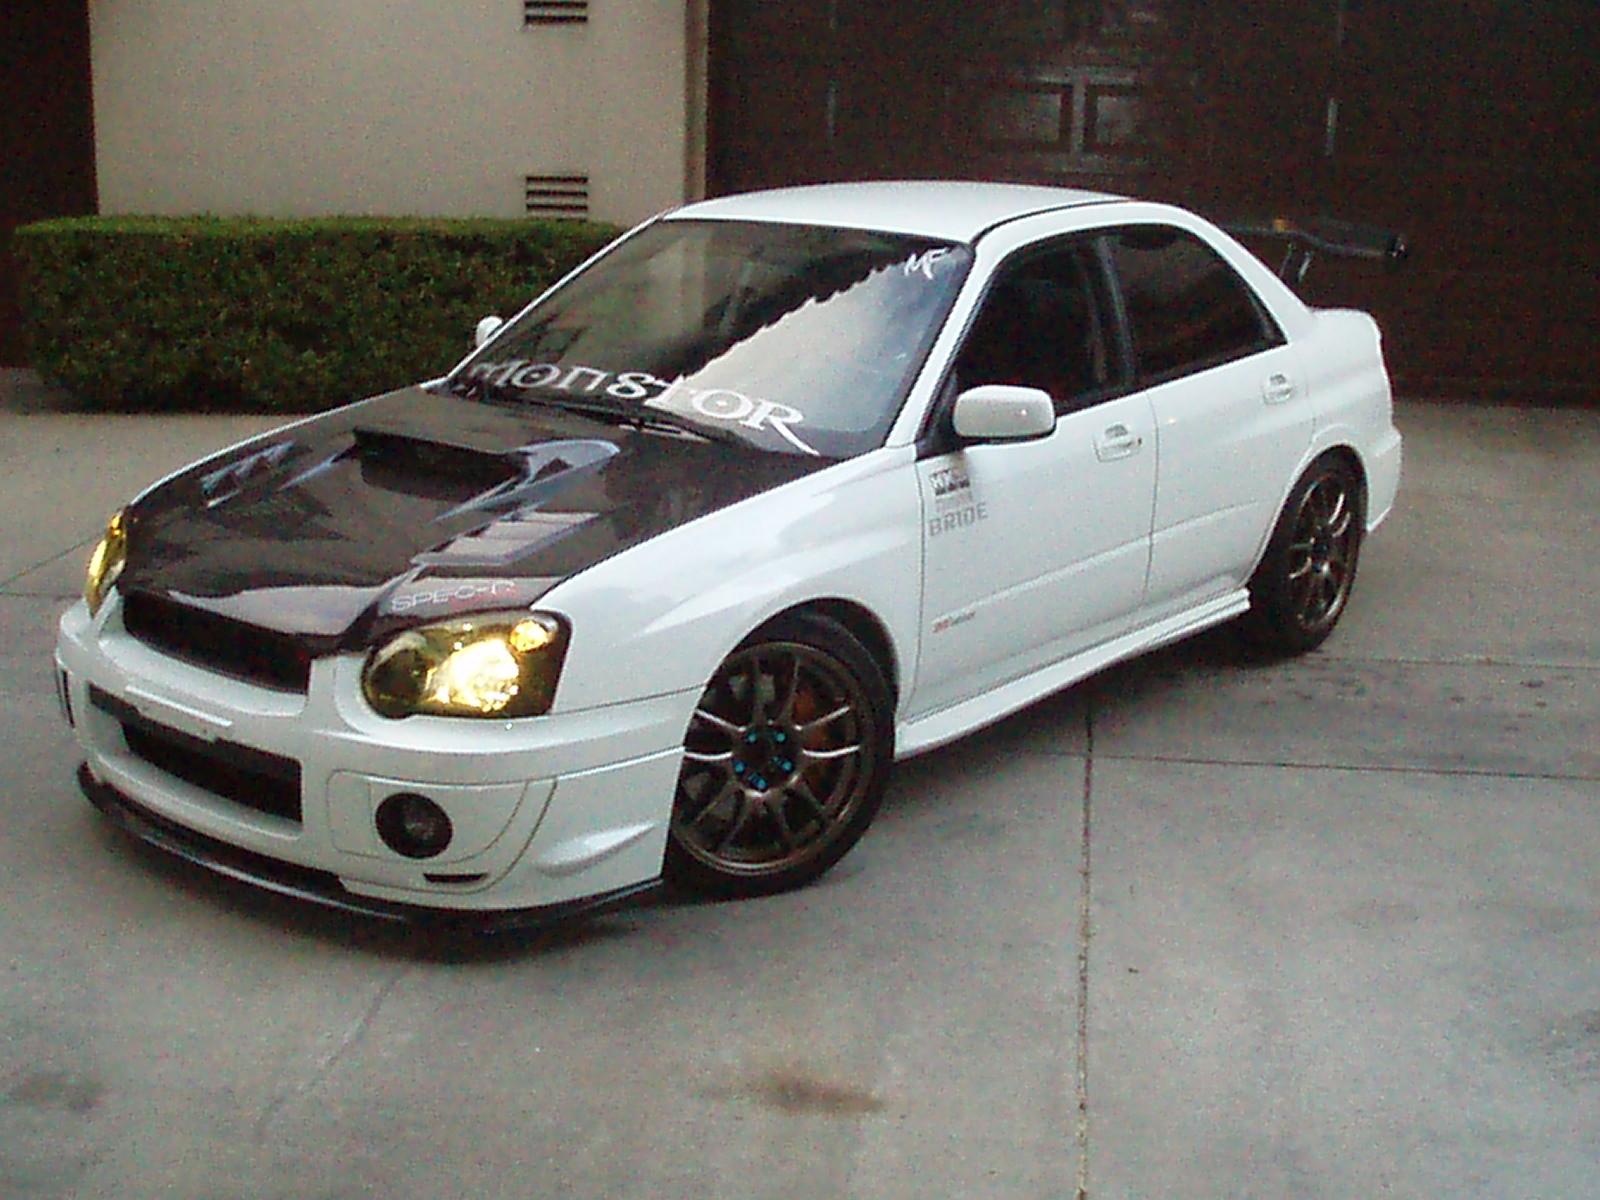 2005 Subaru Impreza Wrx Sti Pictures Cargurus